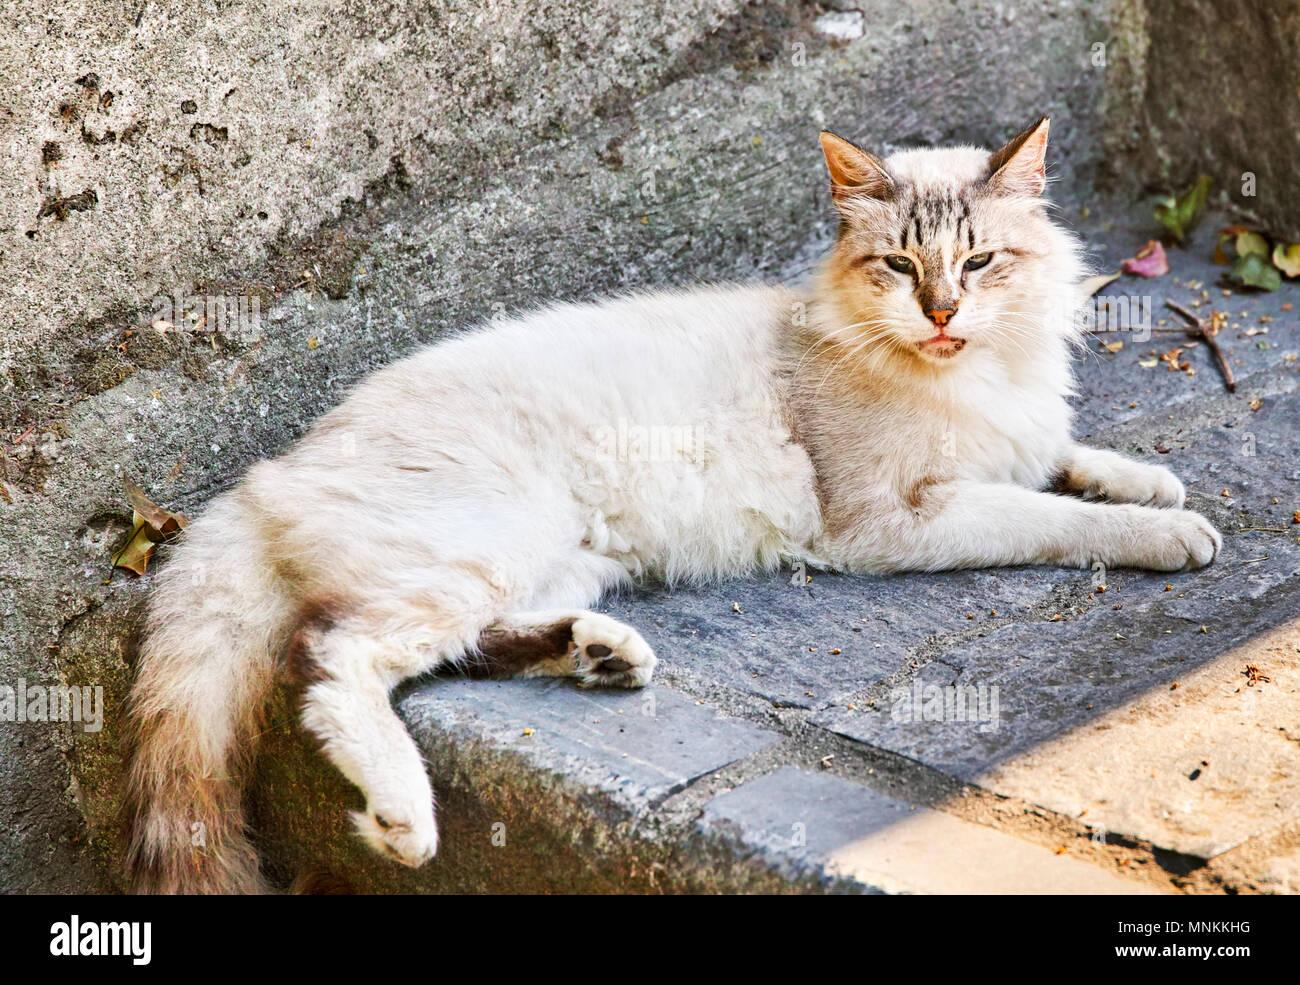 Cats World - Stock Image